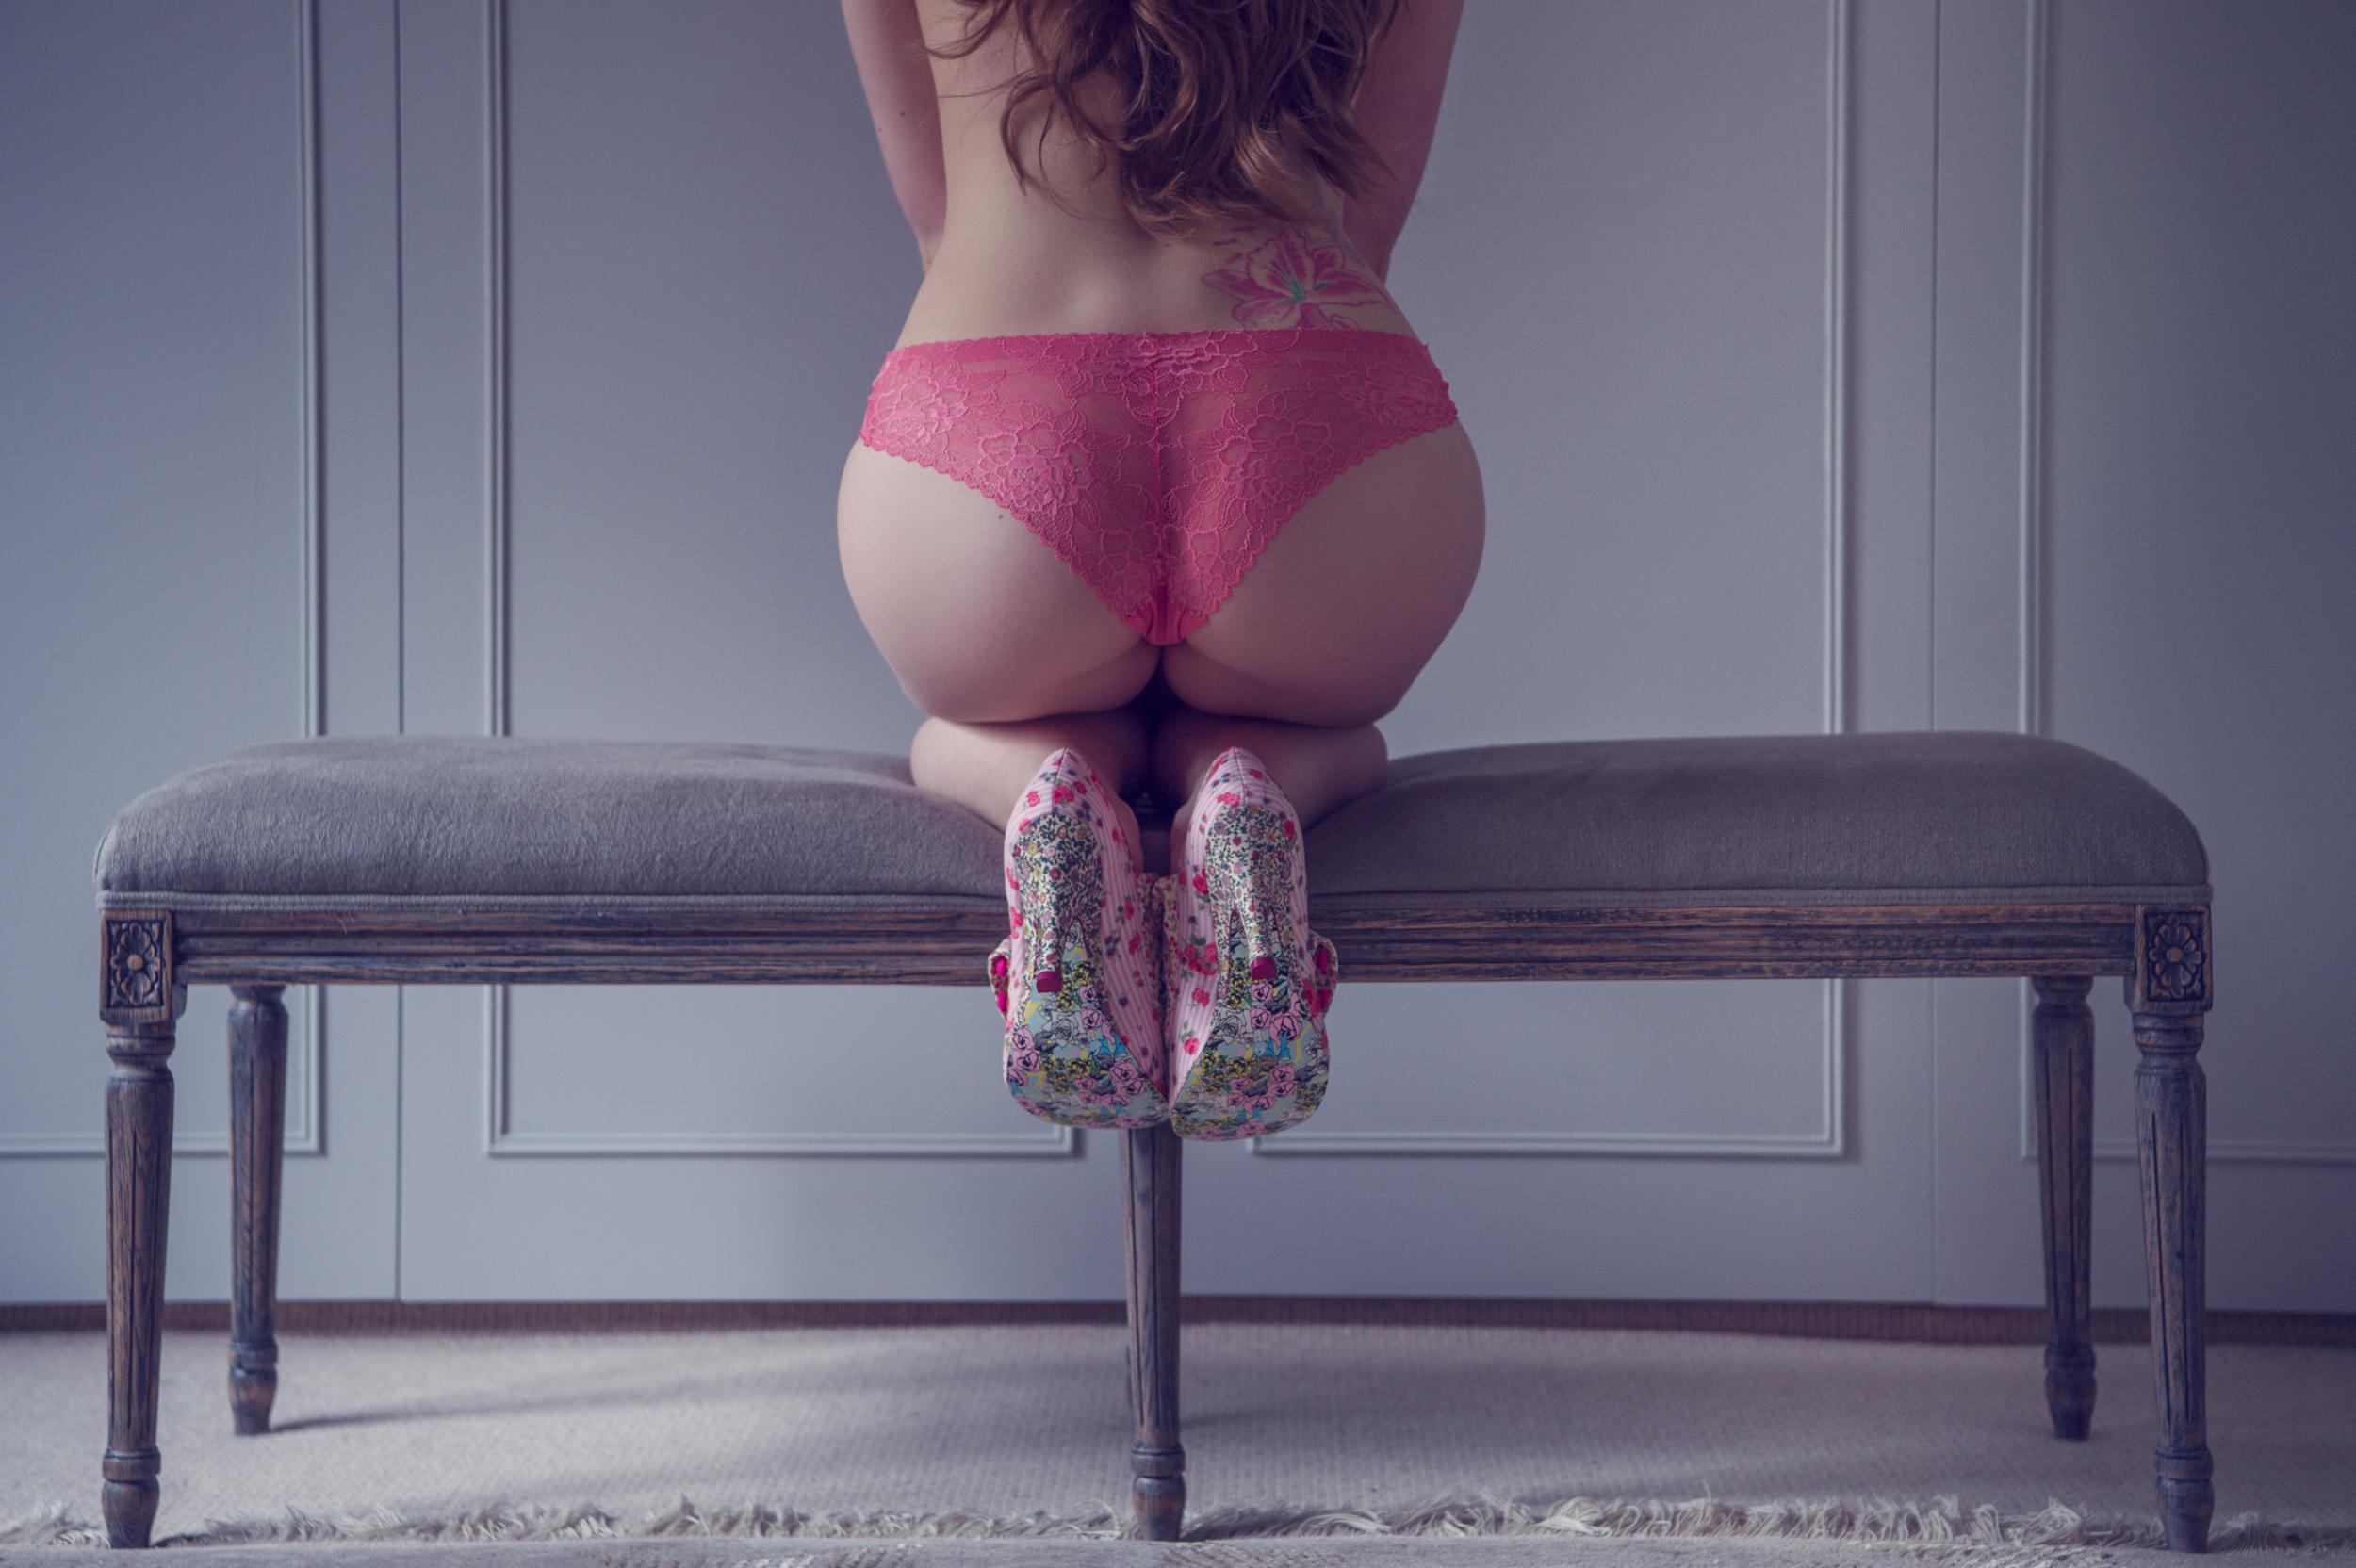 https://katehopewellsmith.com/wp-content/uploads/boudoir-photography-experience-testimonial-by-kate-hopewell-smith-0002.jpg